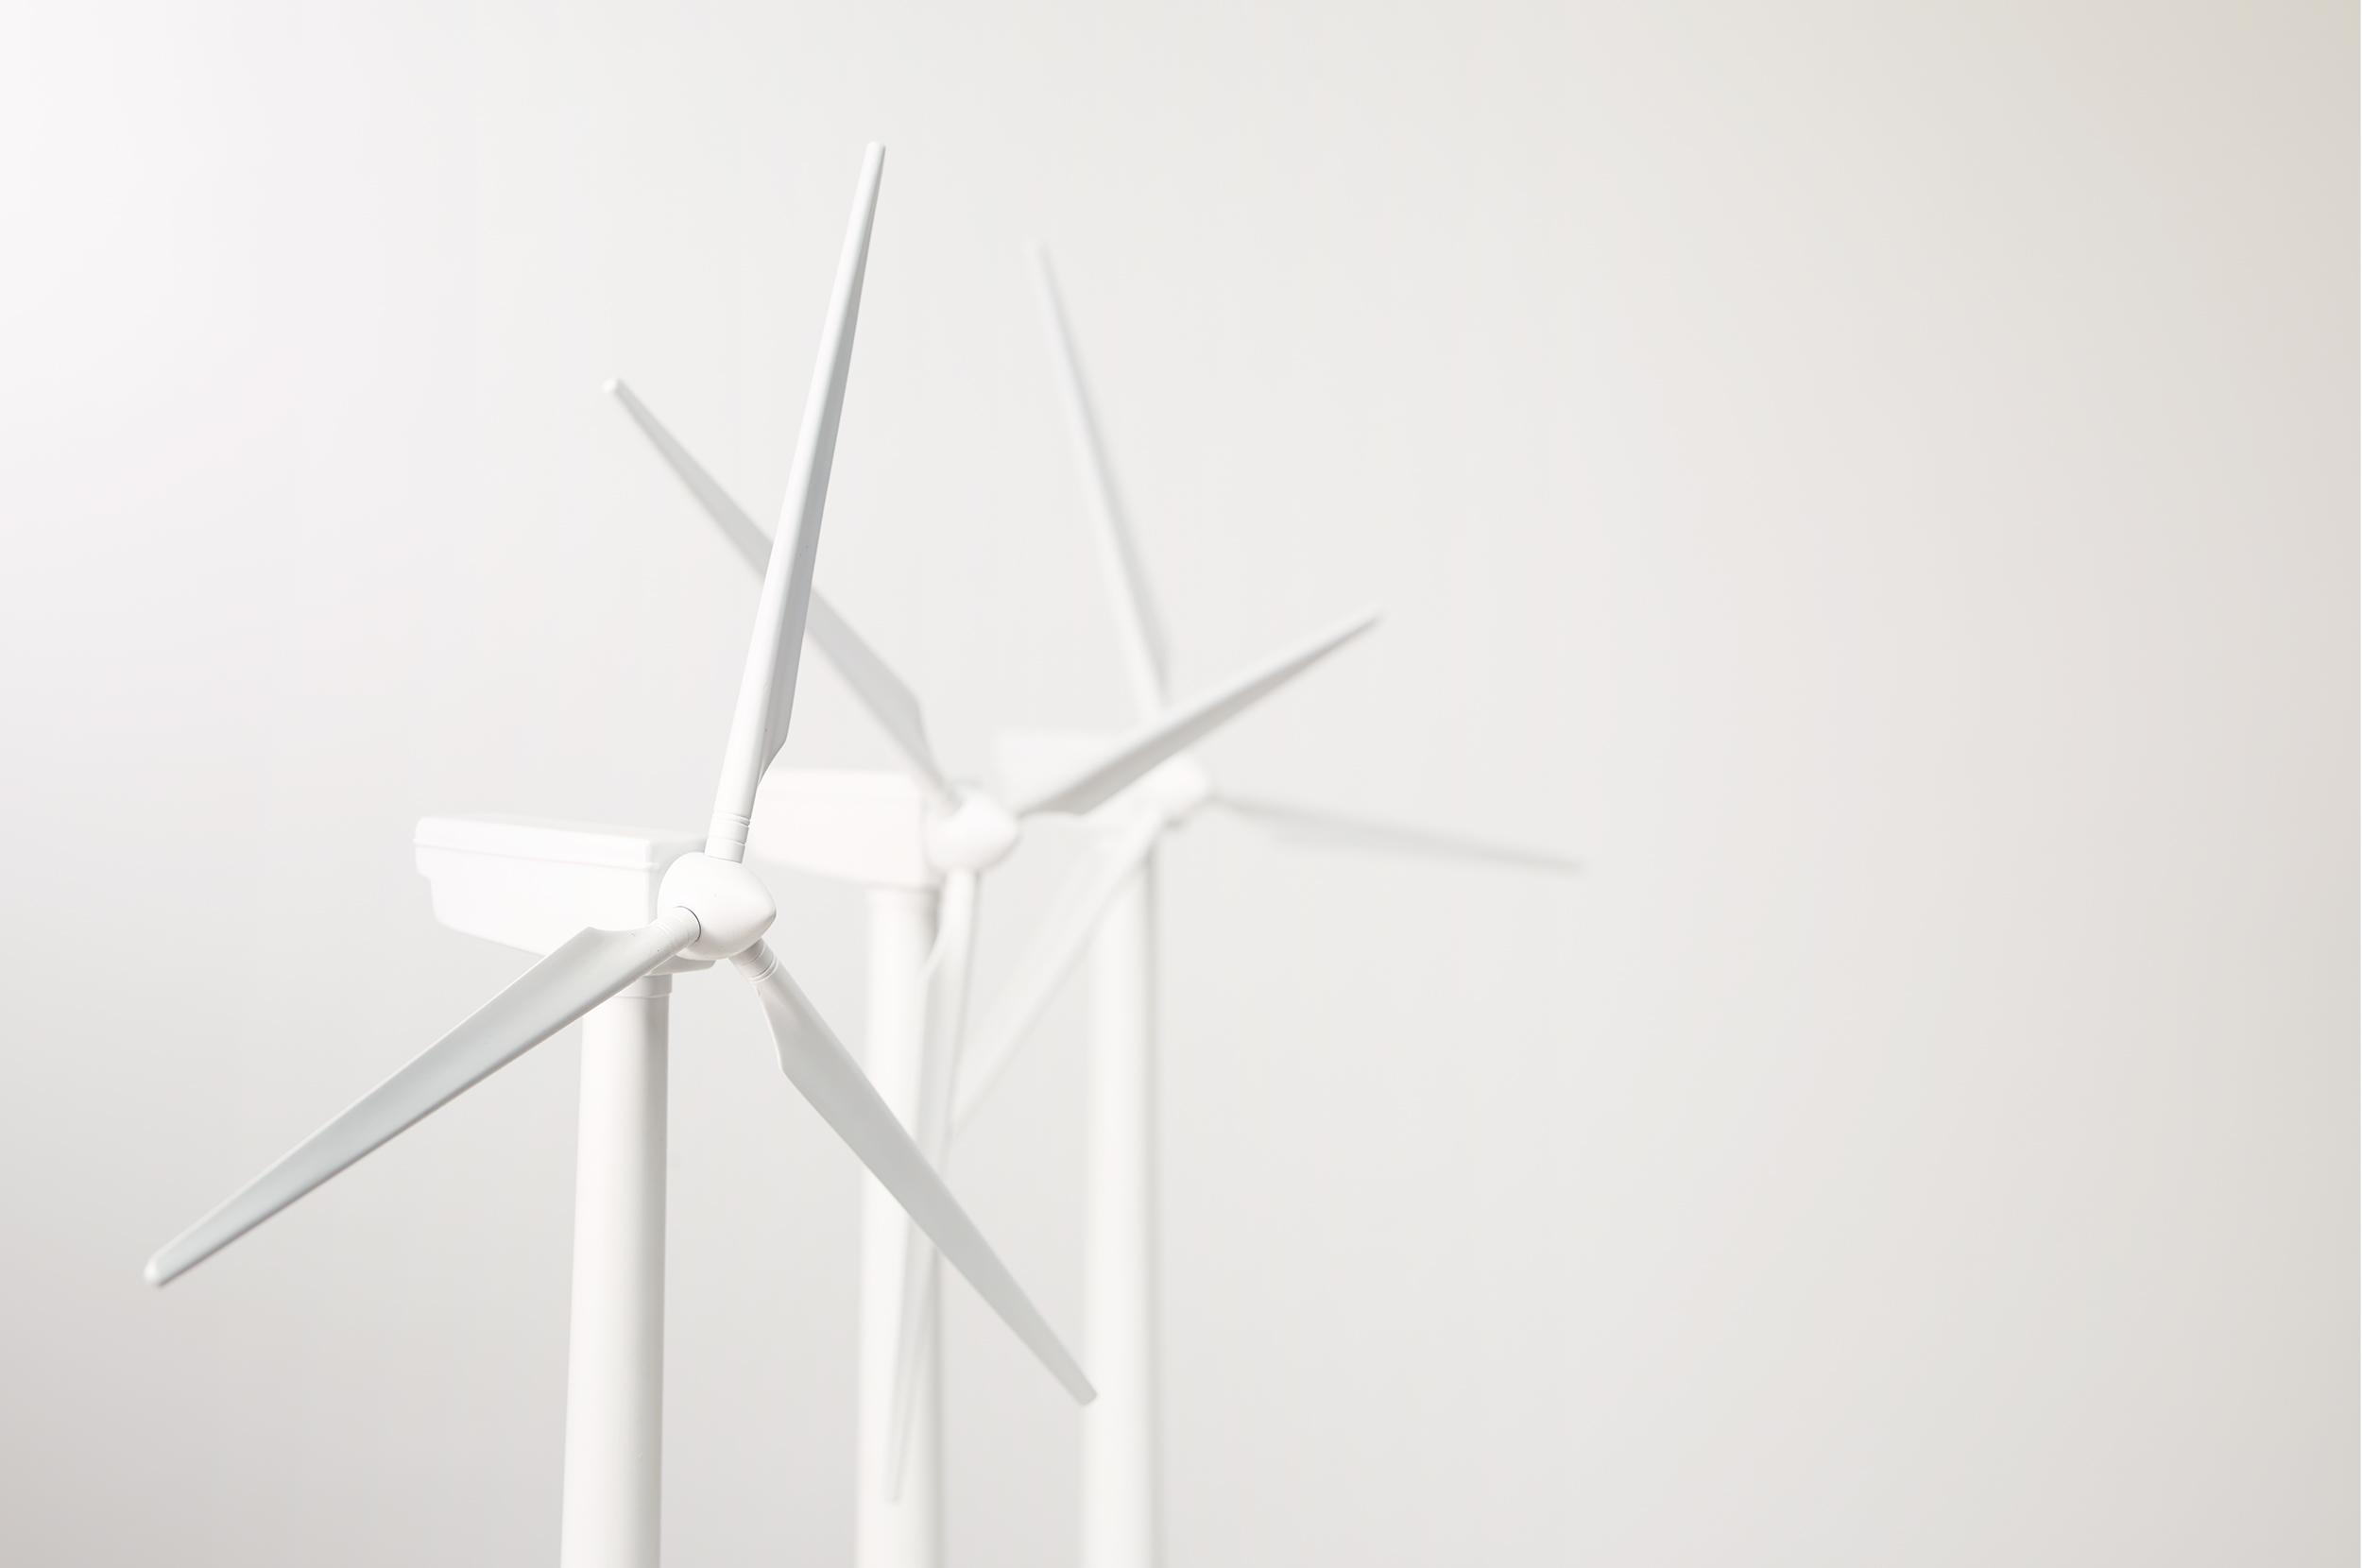 _170106 Post and Gleam table top Windmills3 COMP R1 FLLR.jpg